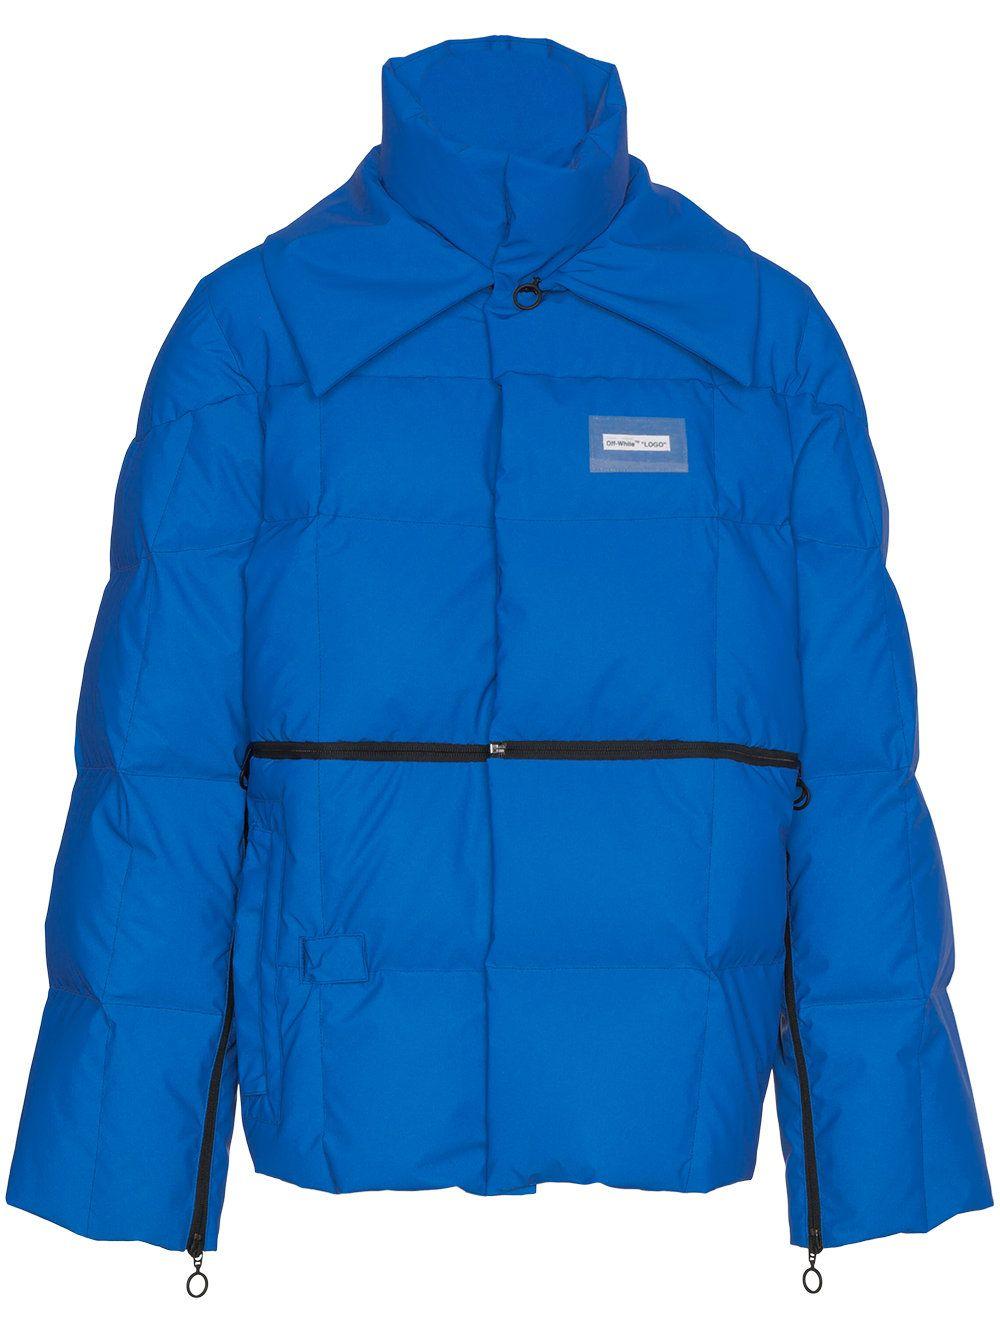 Off White Reflective Puffer Jacket In Blue Modesens Jackets Men Fashion Mens Jackets Leather Jacket Men [ 1334 x 1000 Pixel ]